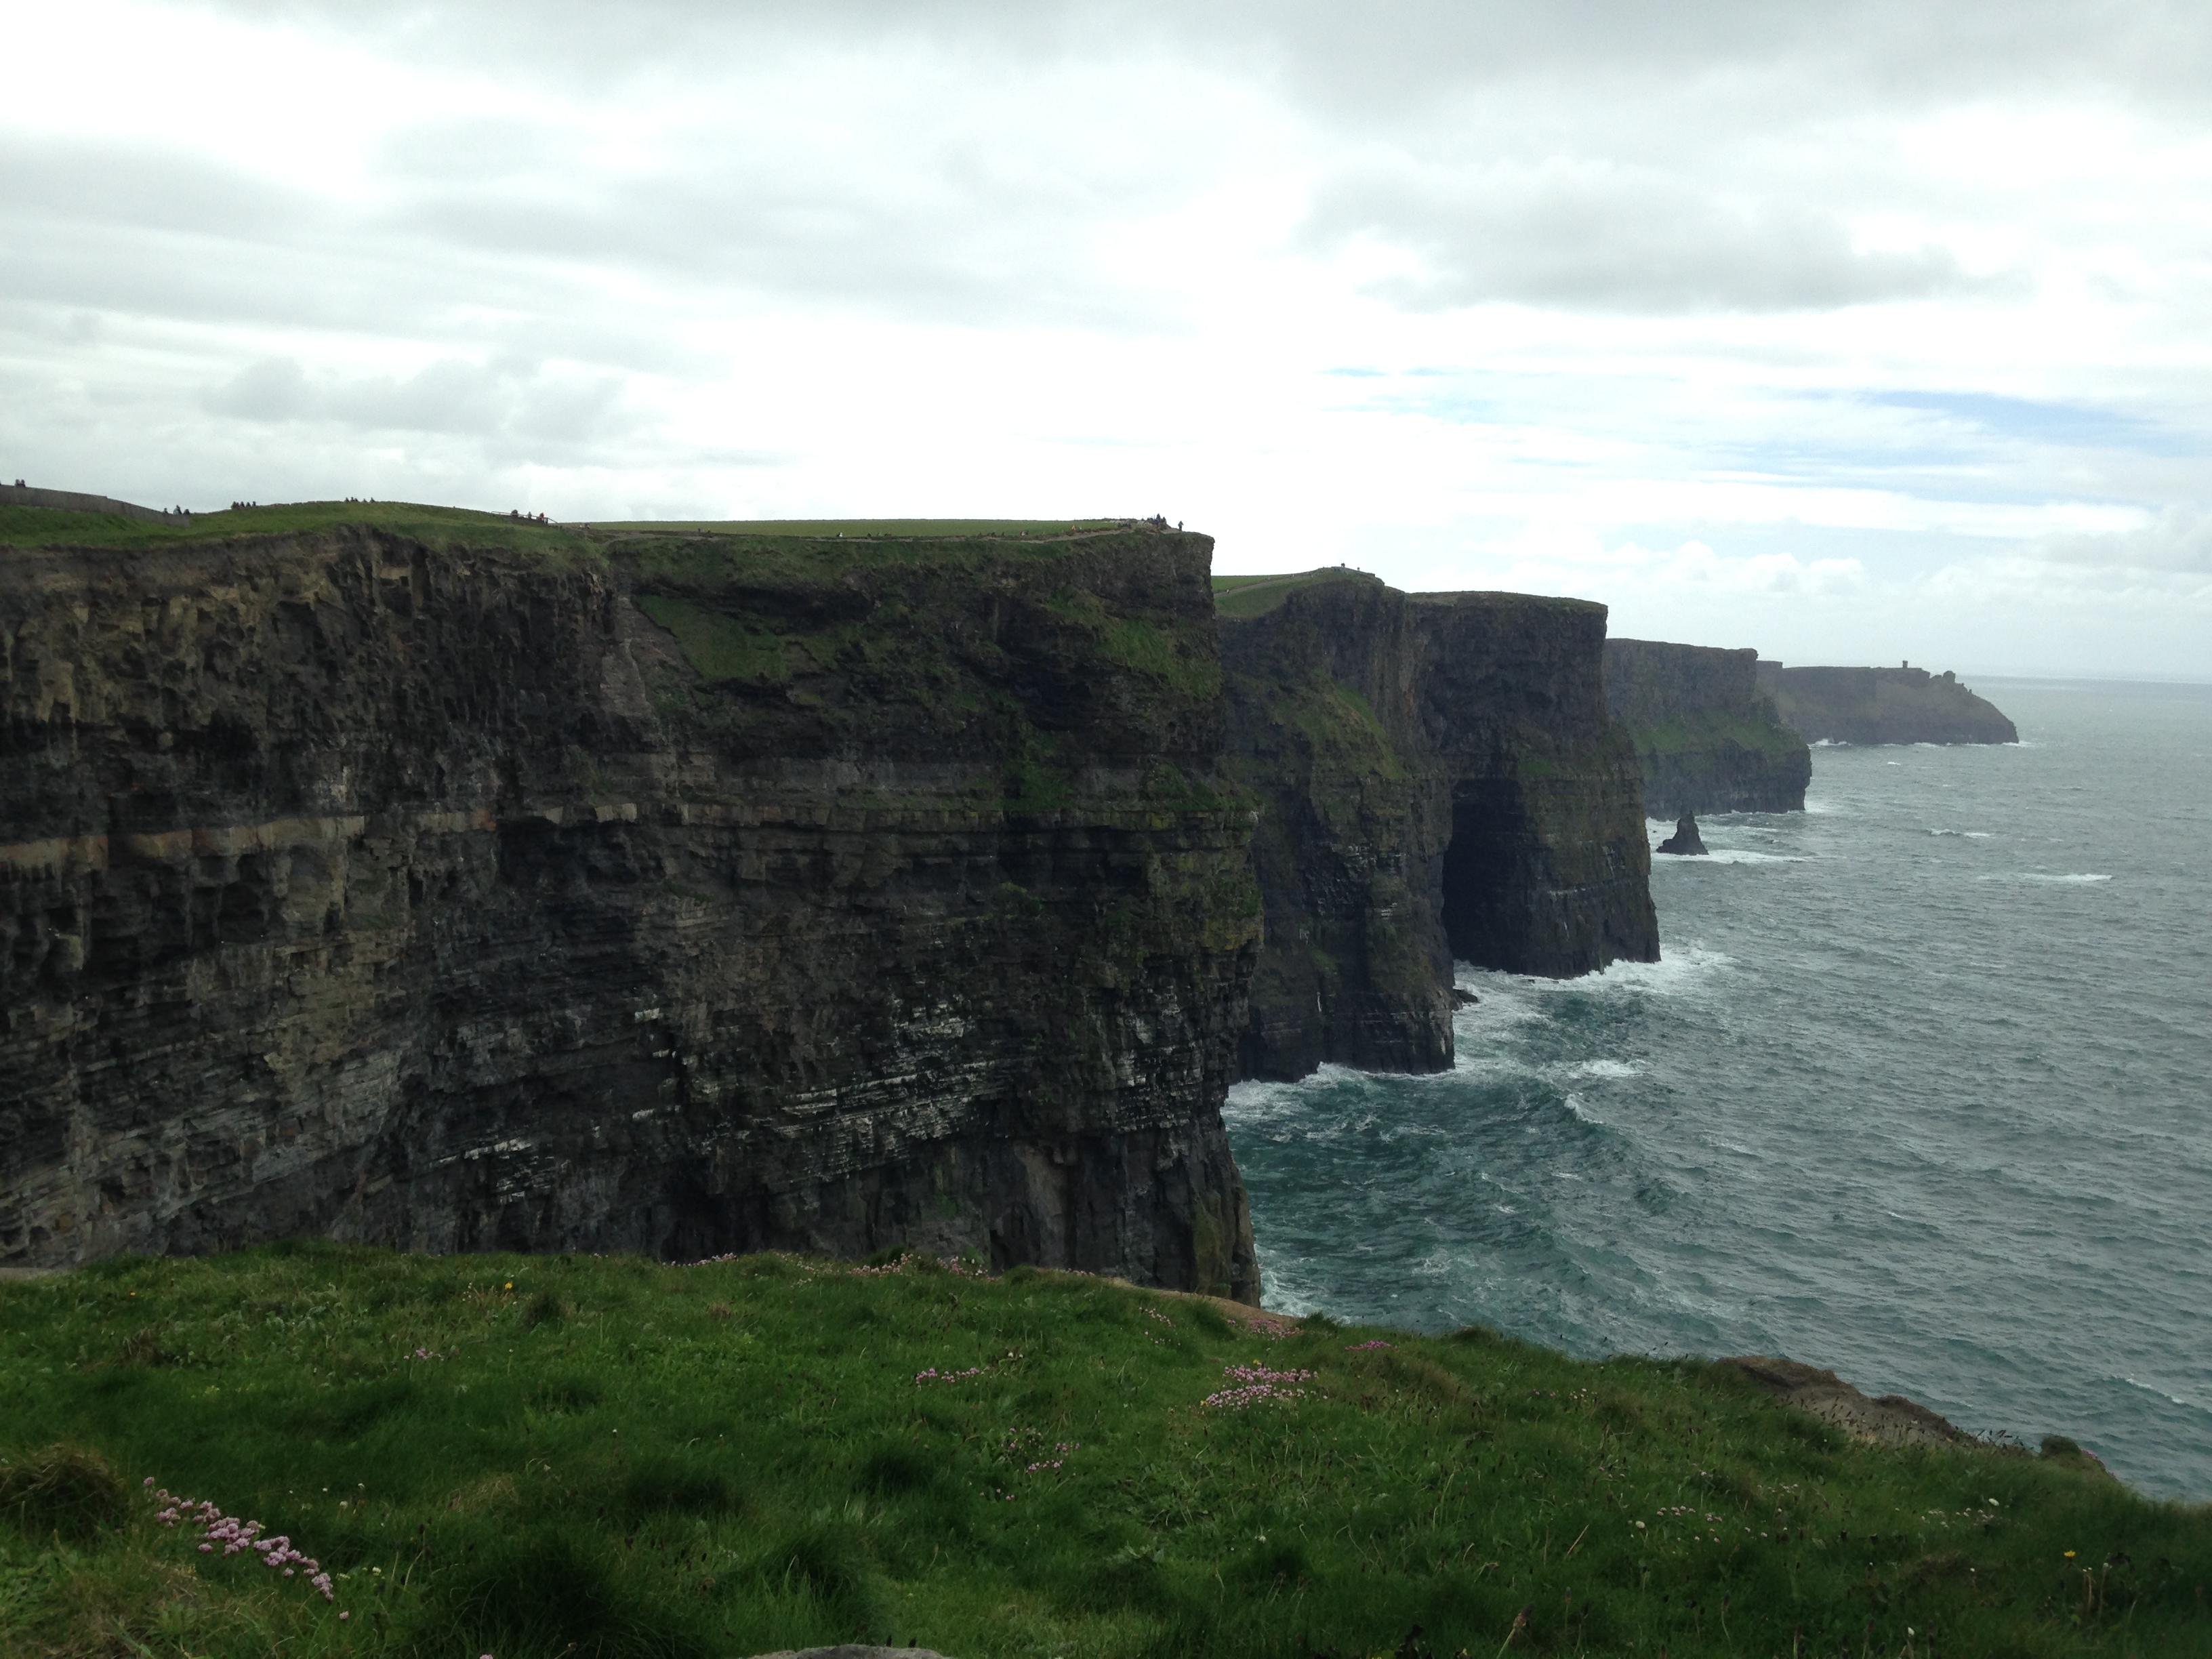 Cliffs of Moher: Ireland